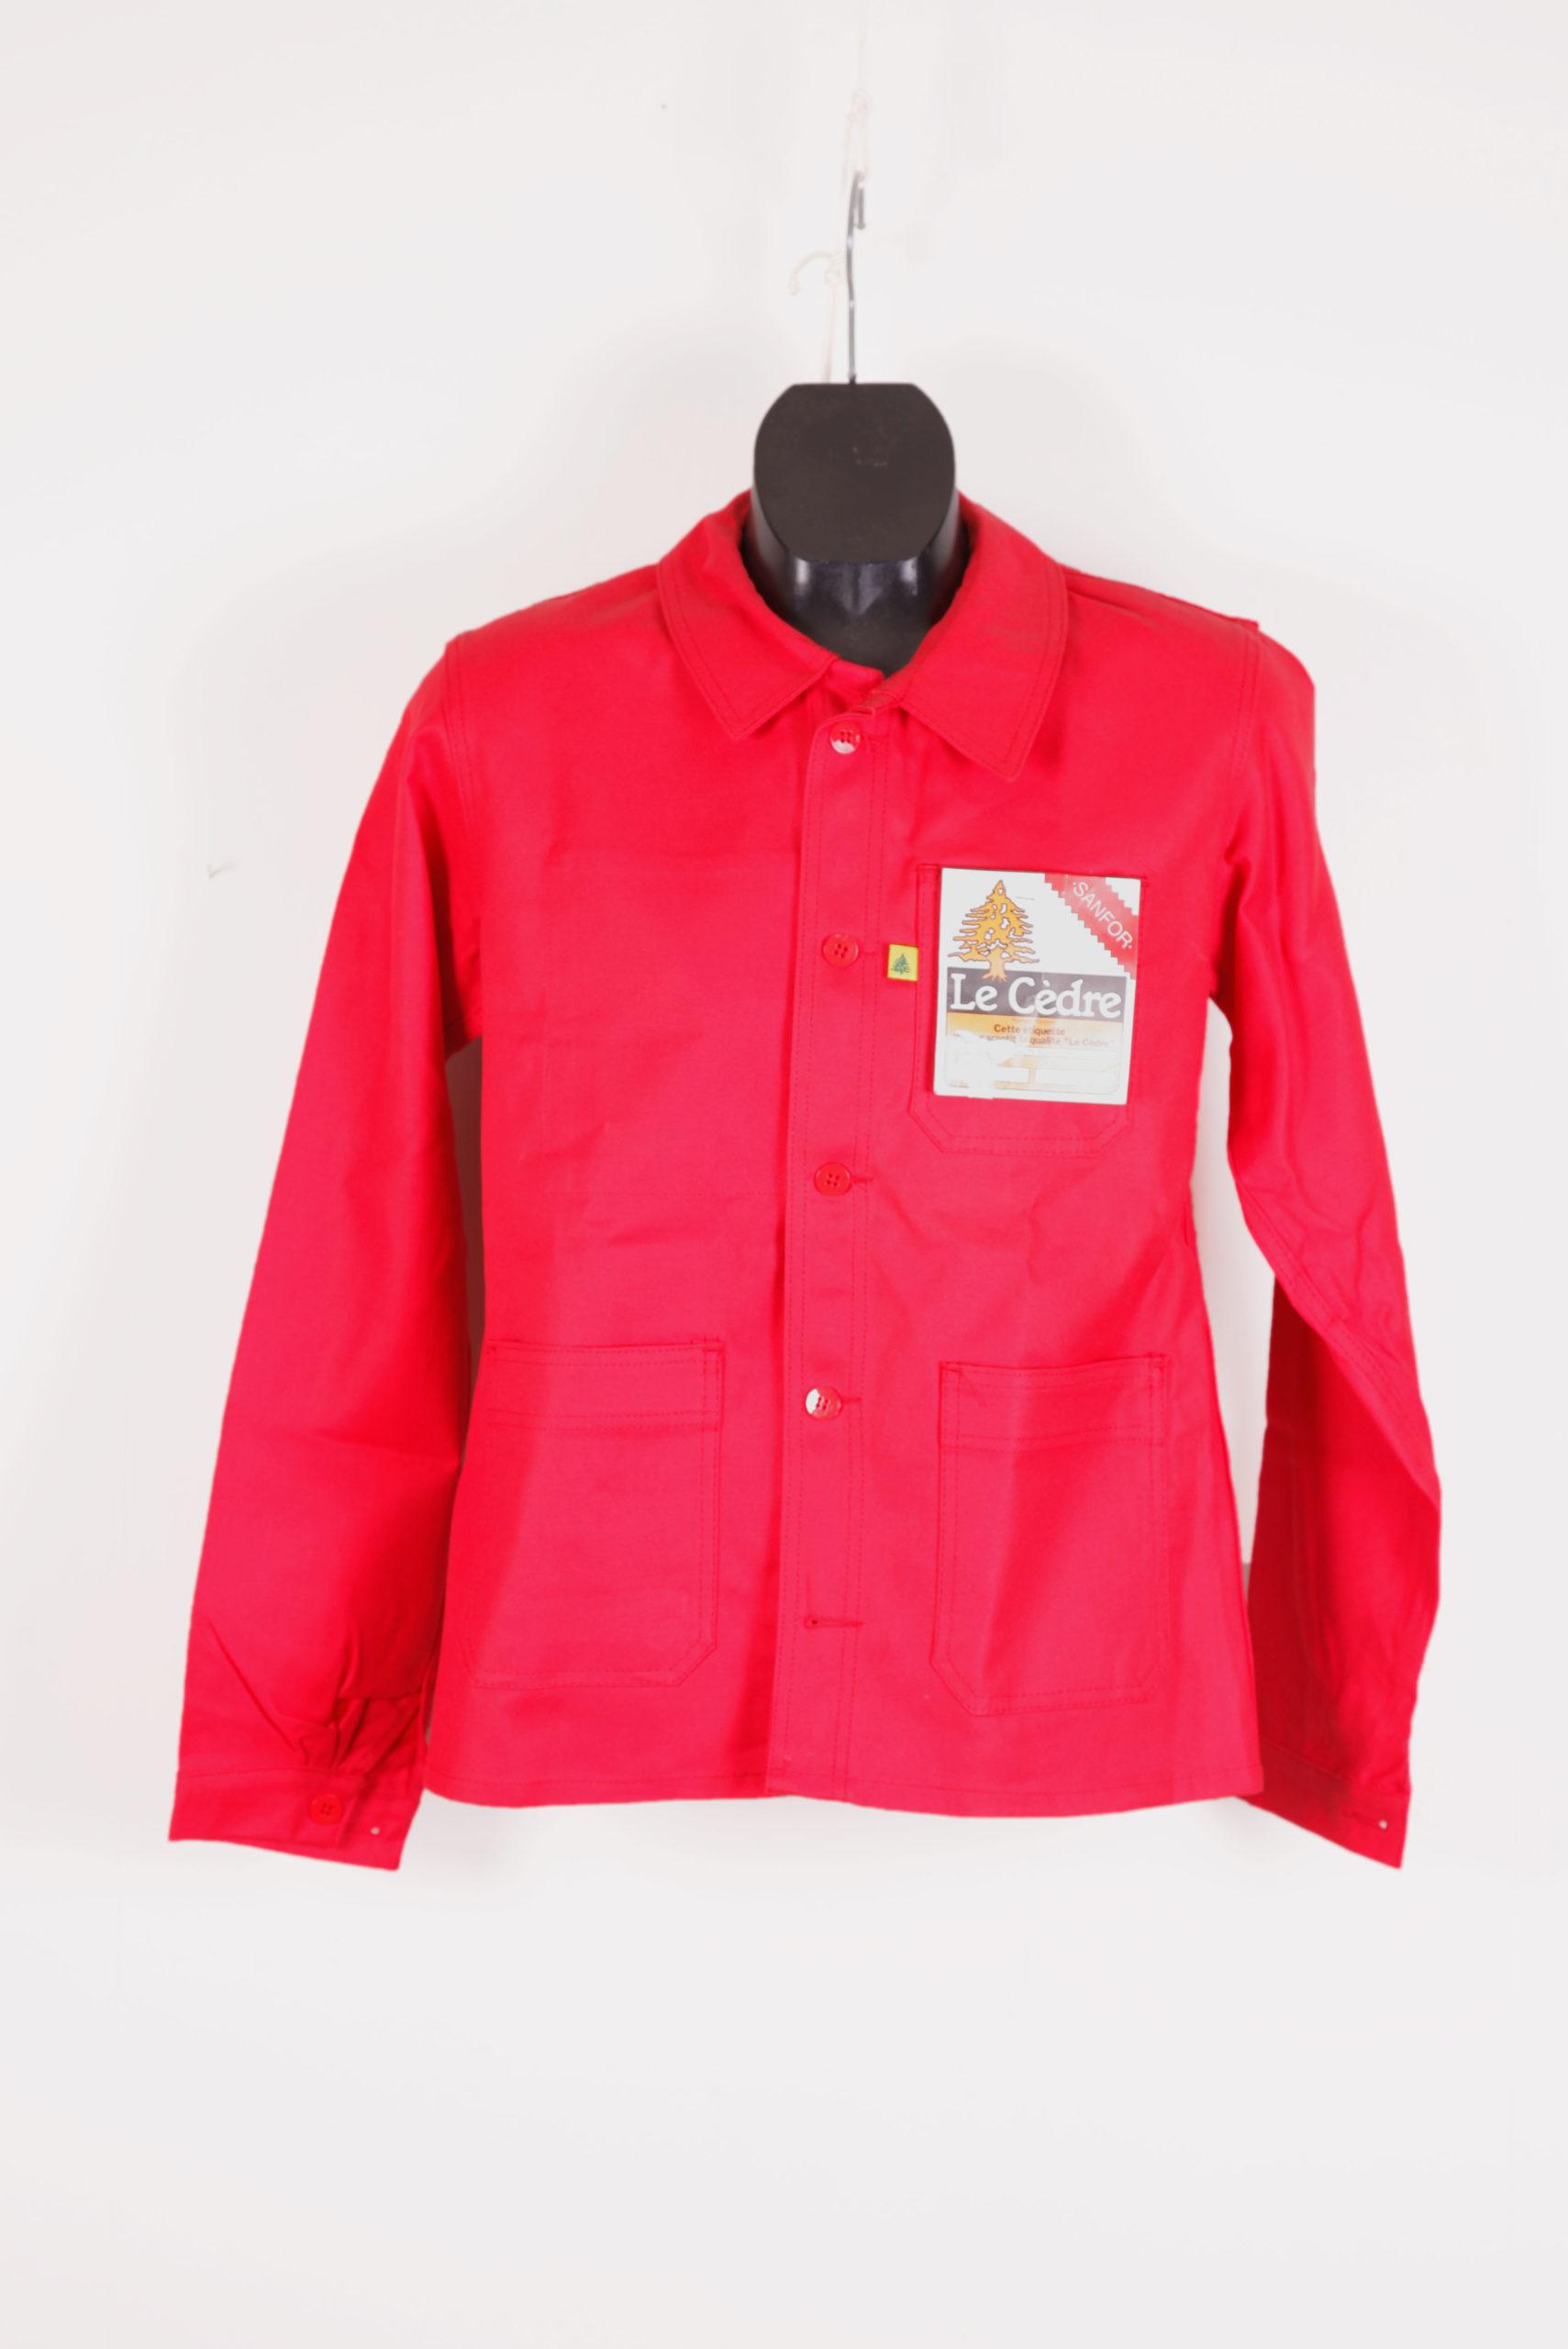 1960's french red moleskin work jacket